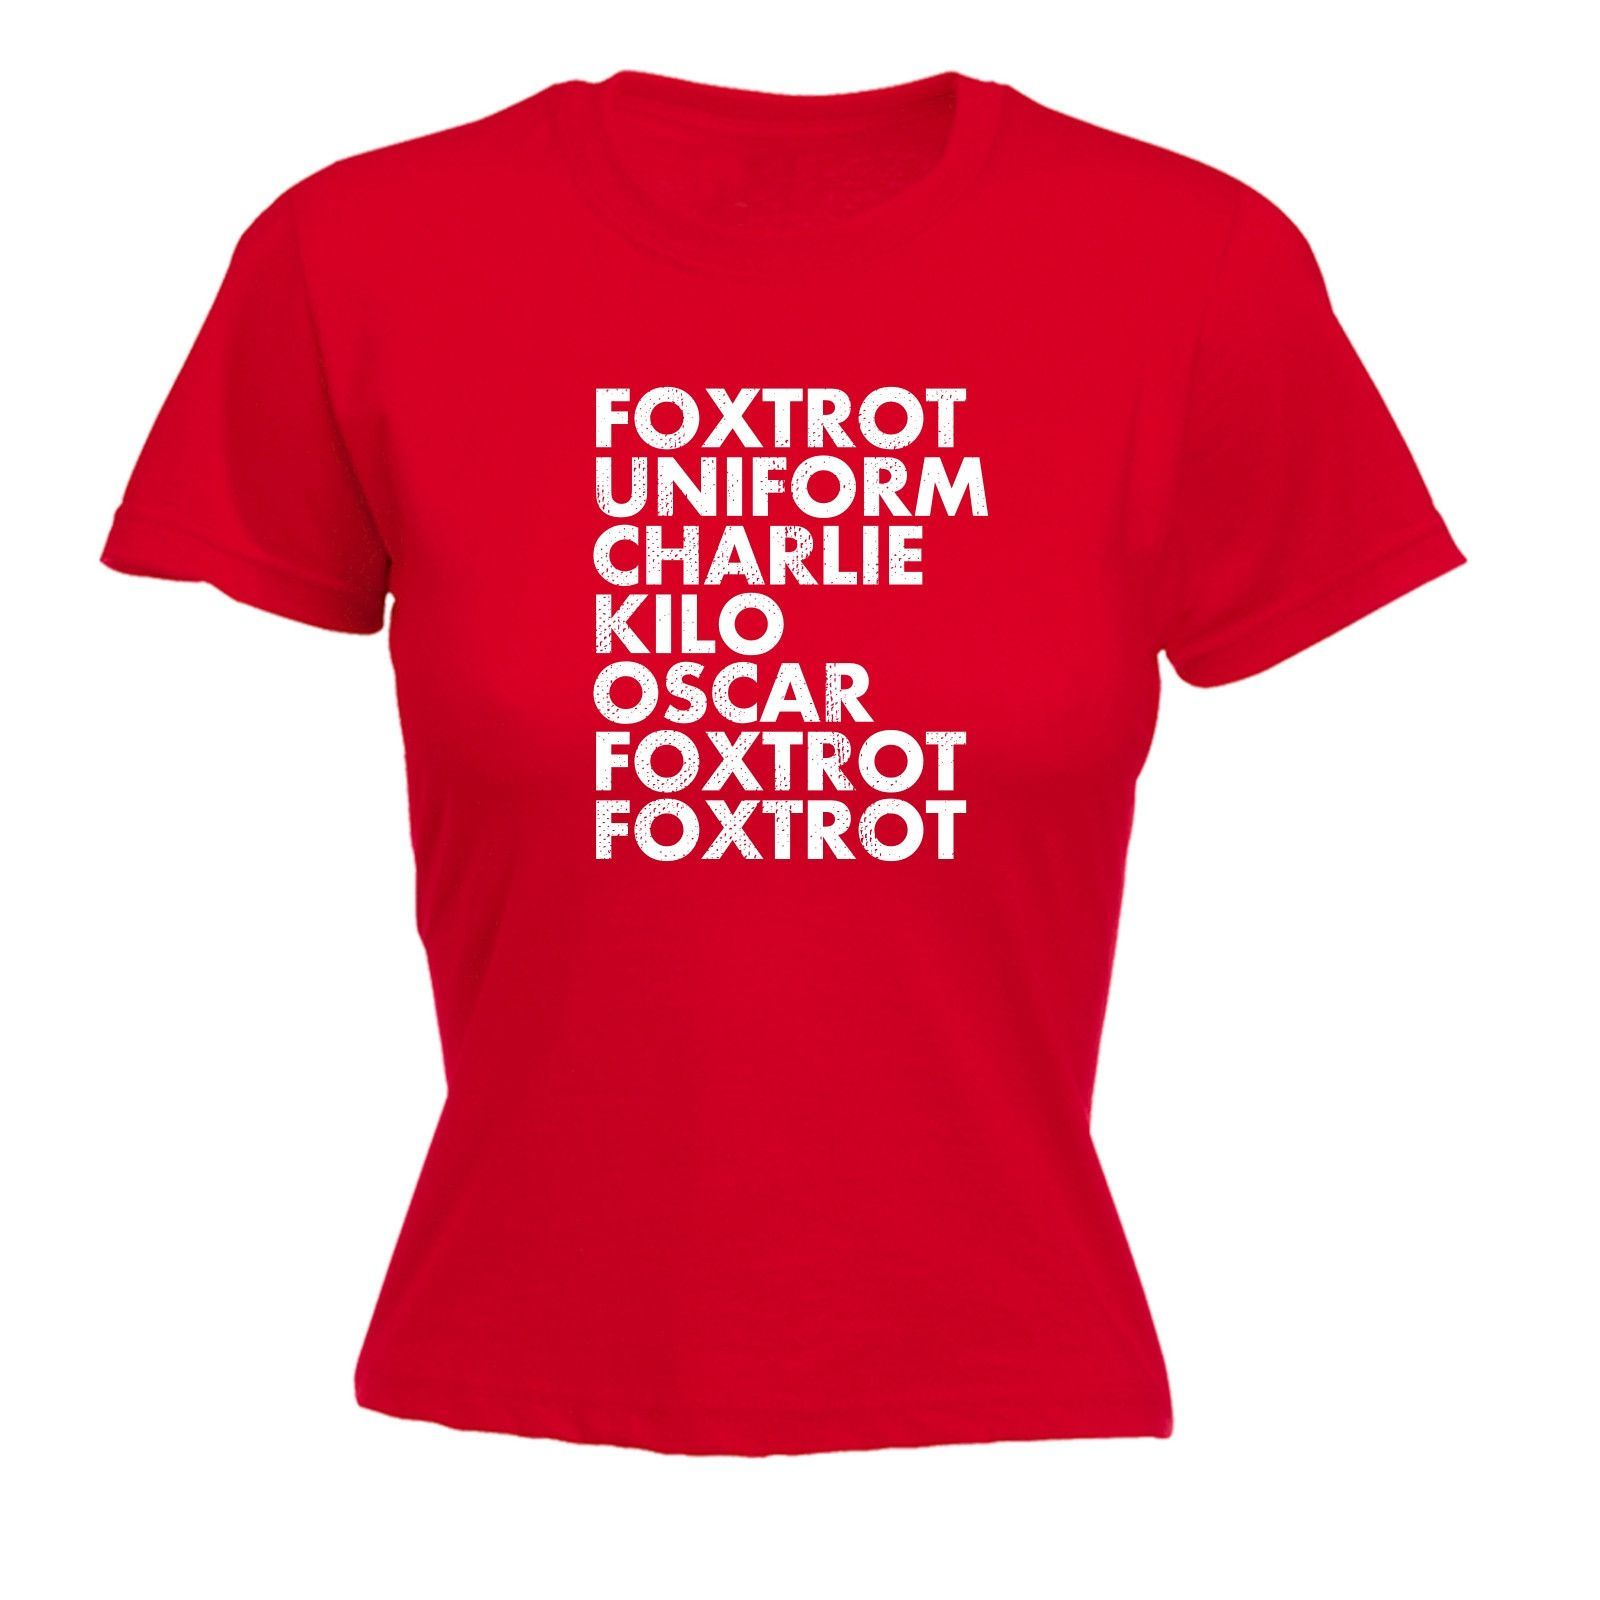 Buy 123t Women's Foxtrot Uniform Charlie Kilo Oscar